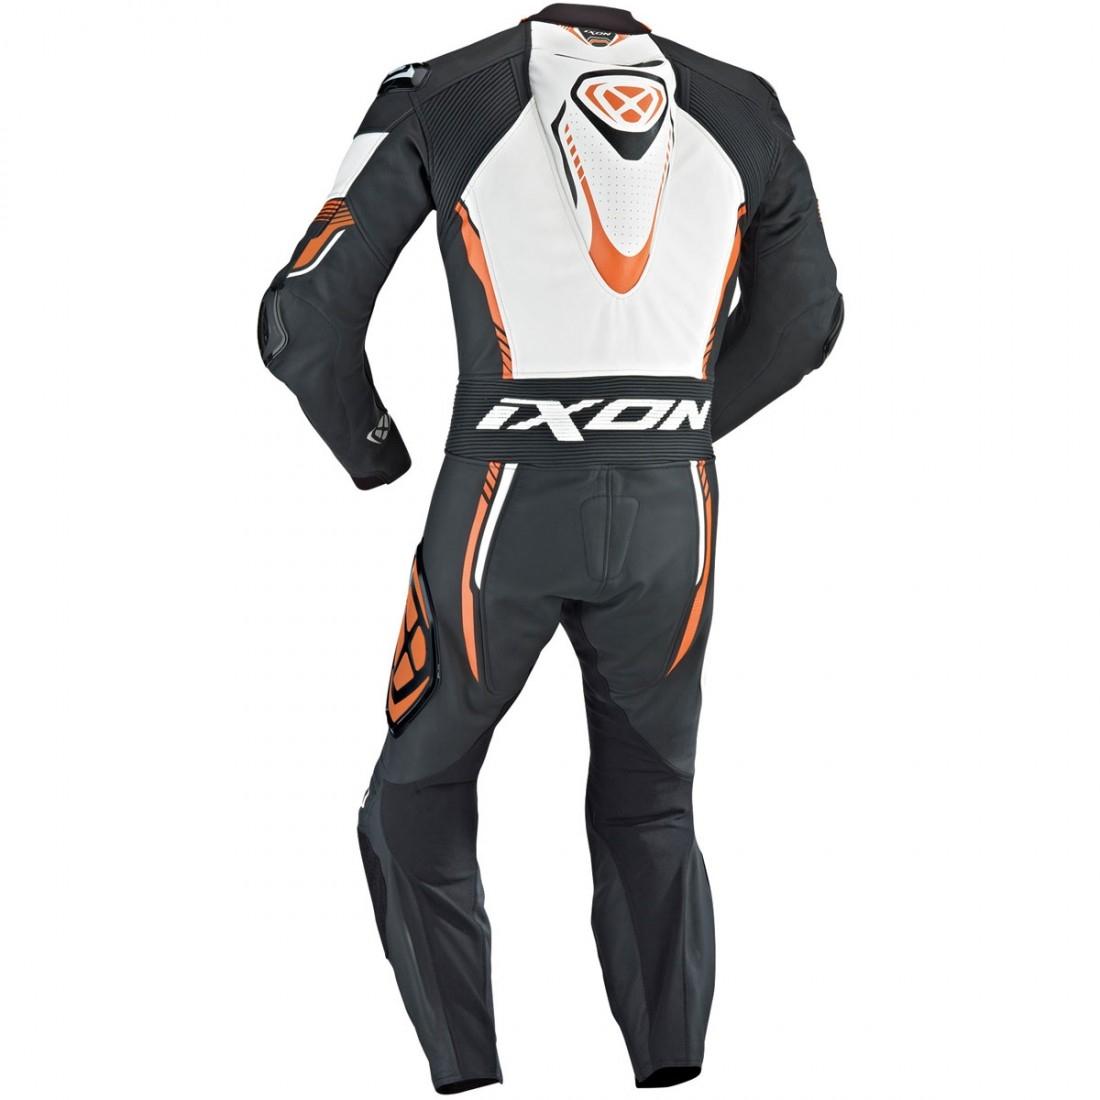 c98136bab17 Traje   Mono IXON Vortex Professional Black   White   Orange · Motocard